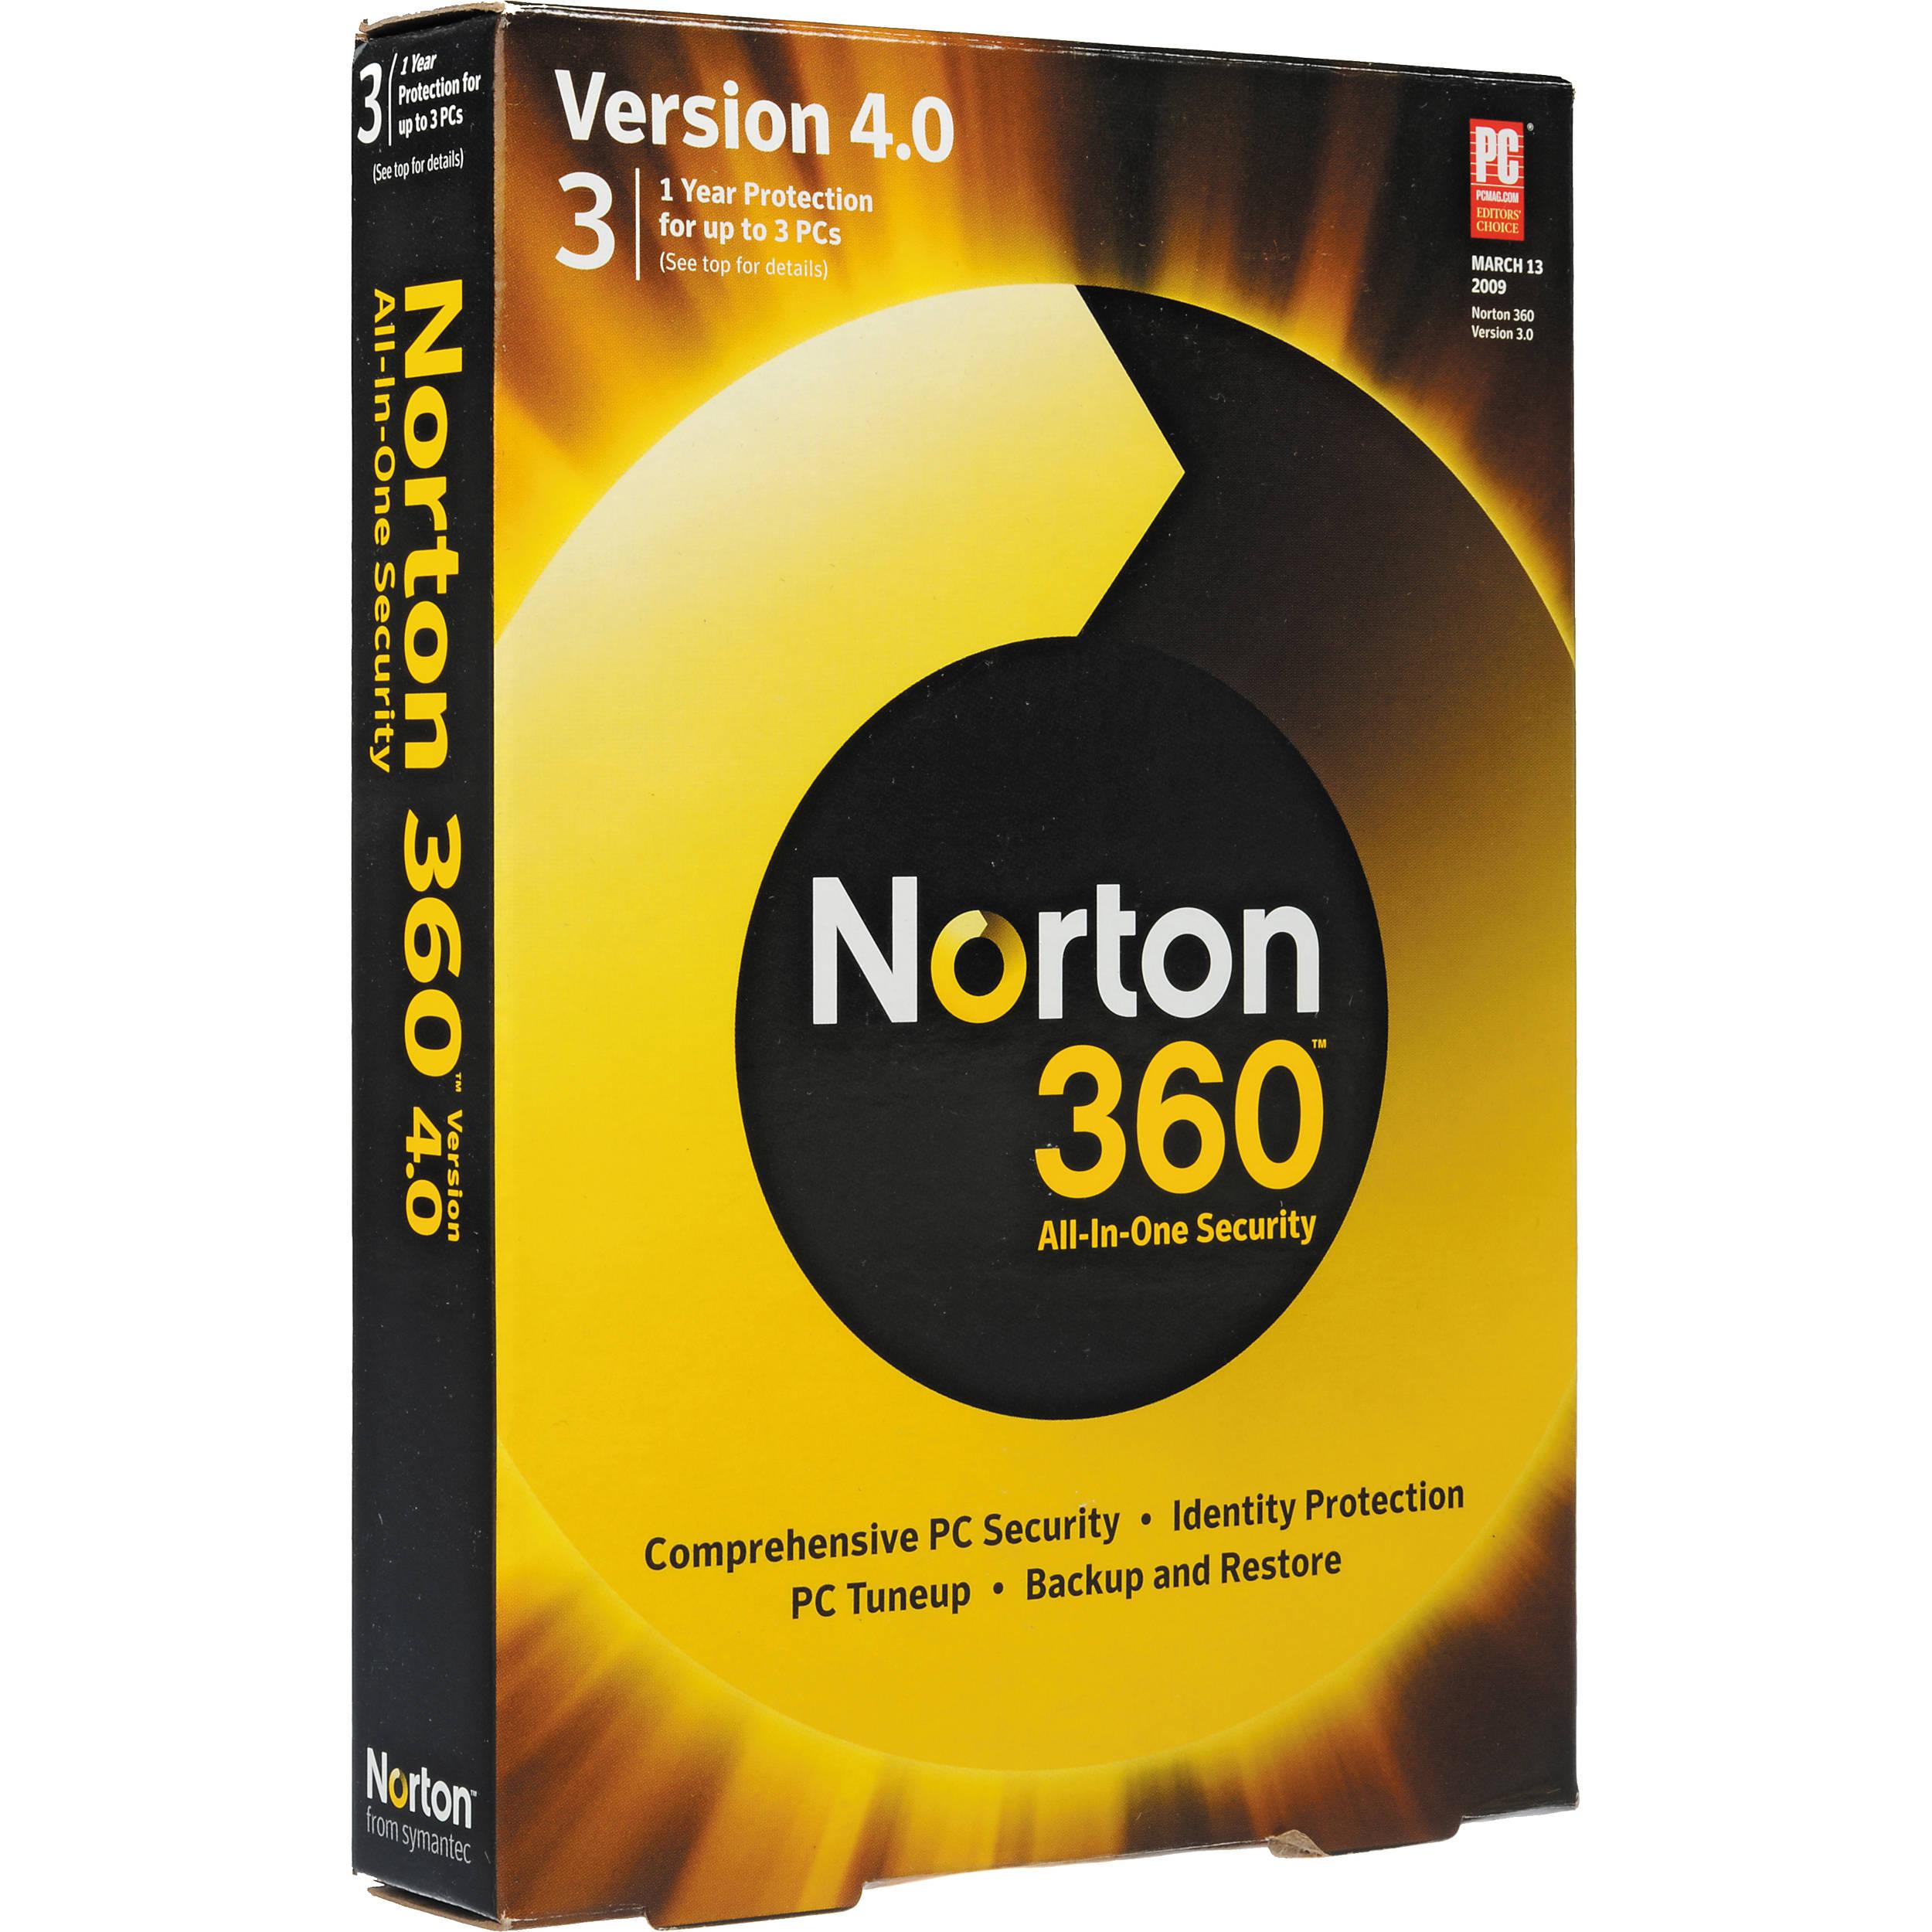 norton block program from accessing internet